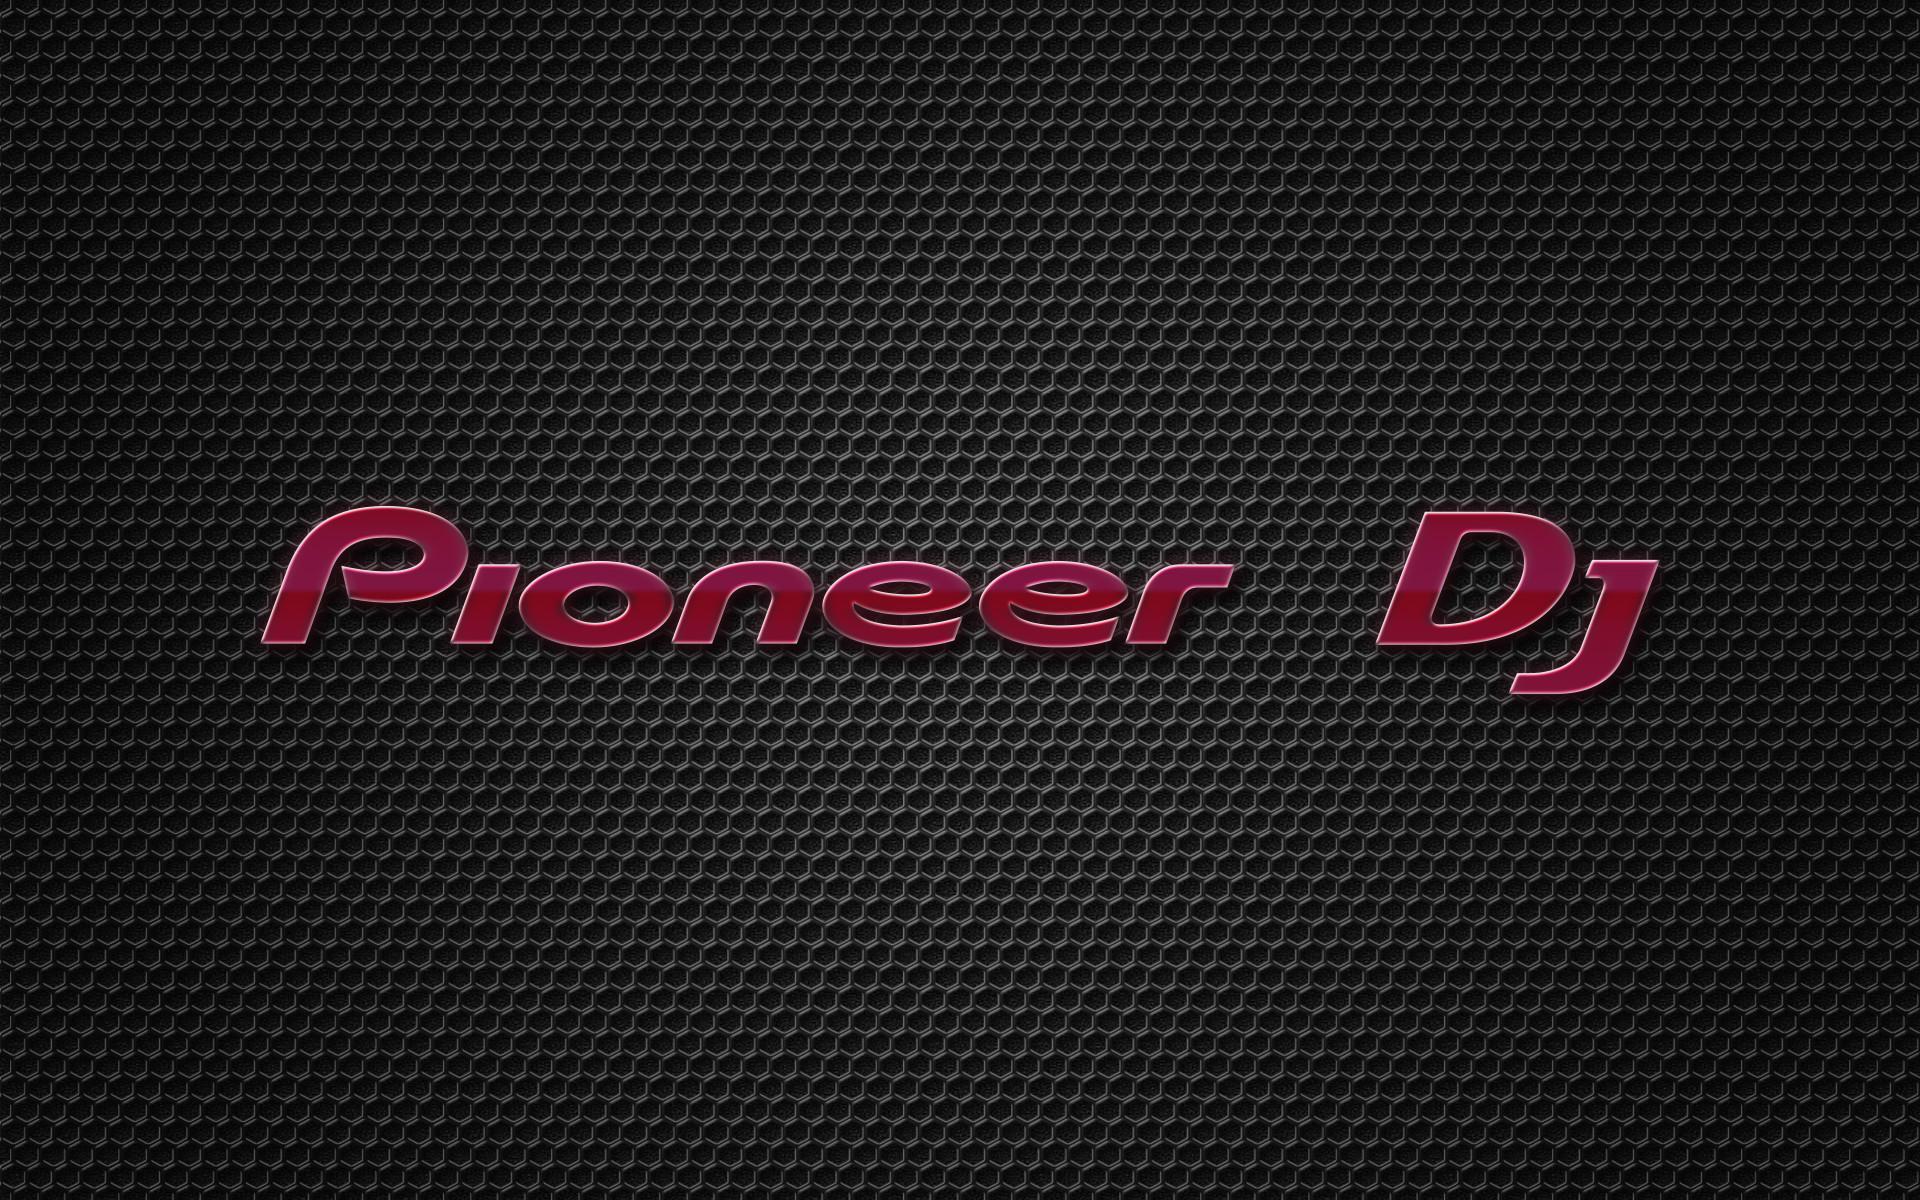 … Pioneer DJ Logo Wallpaper 1 by 2Seven2